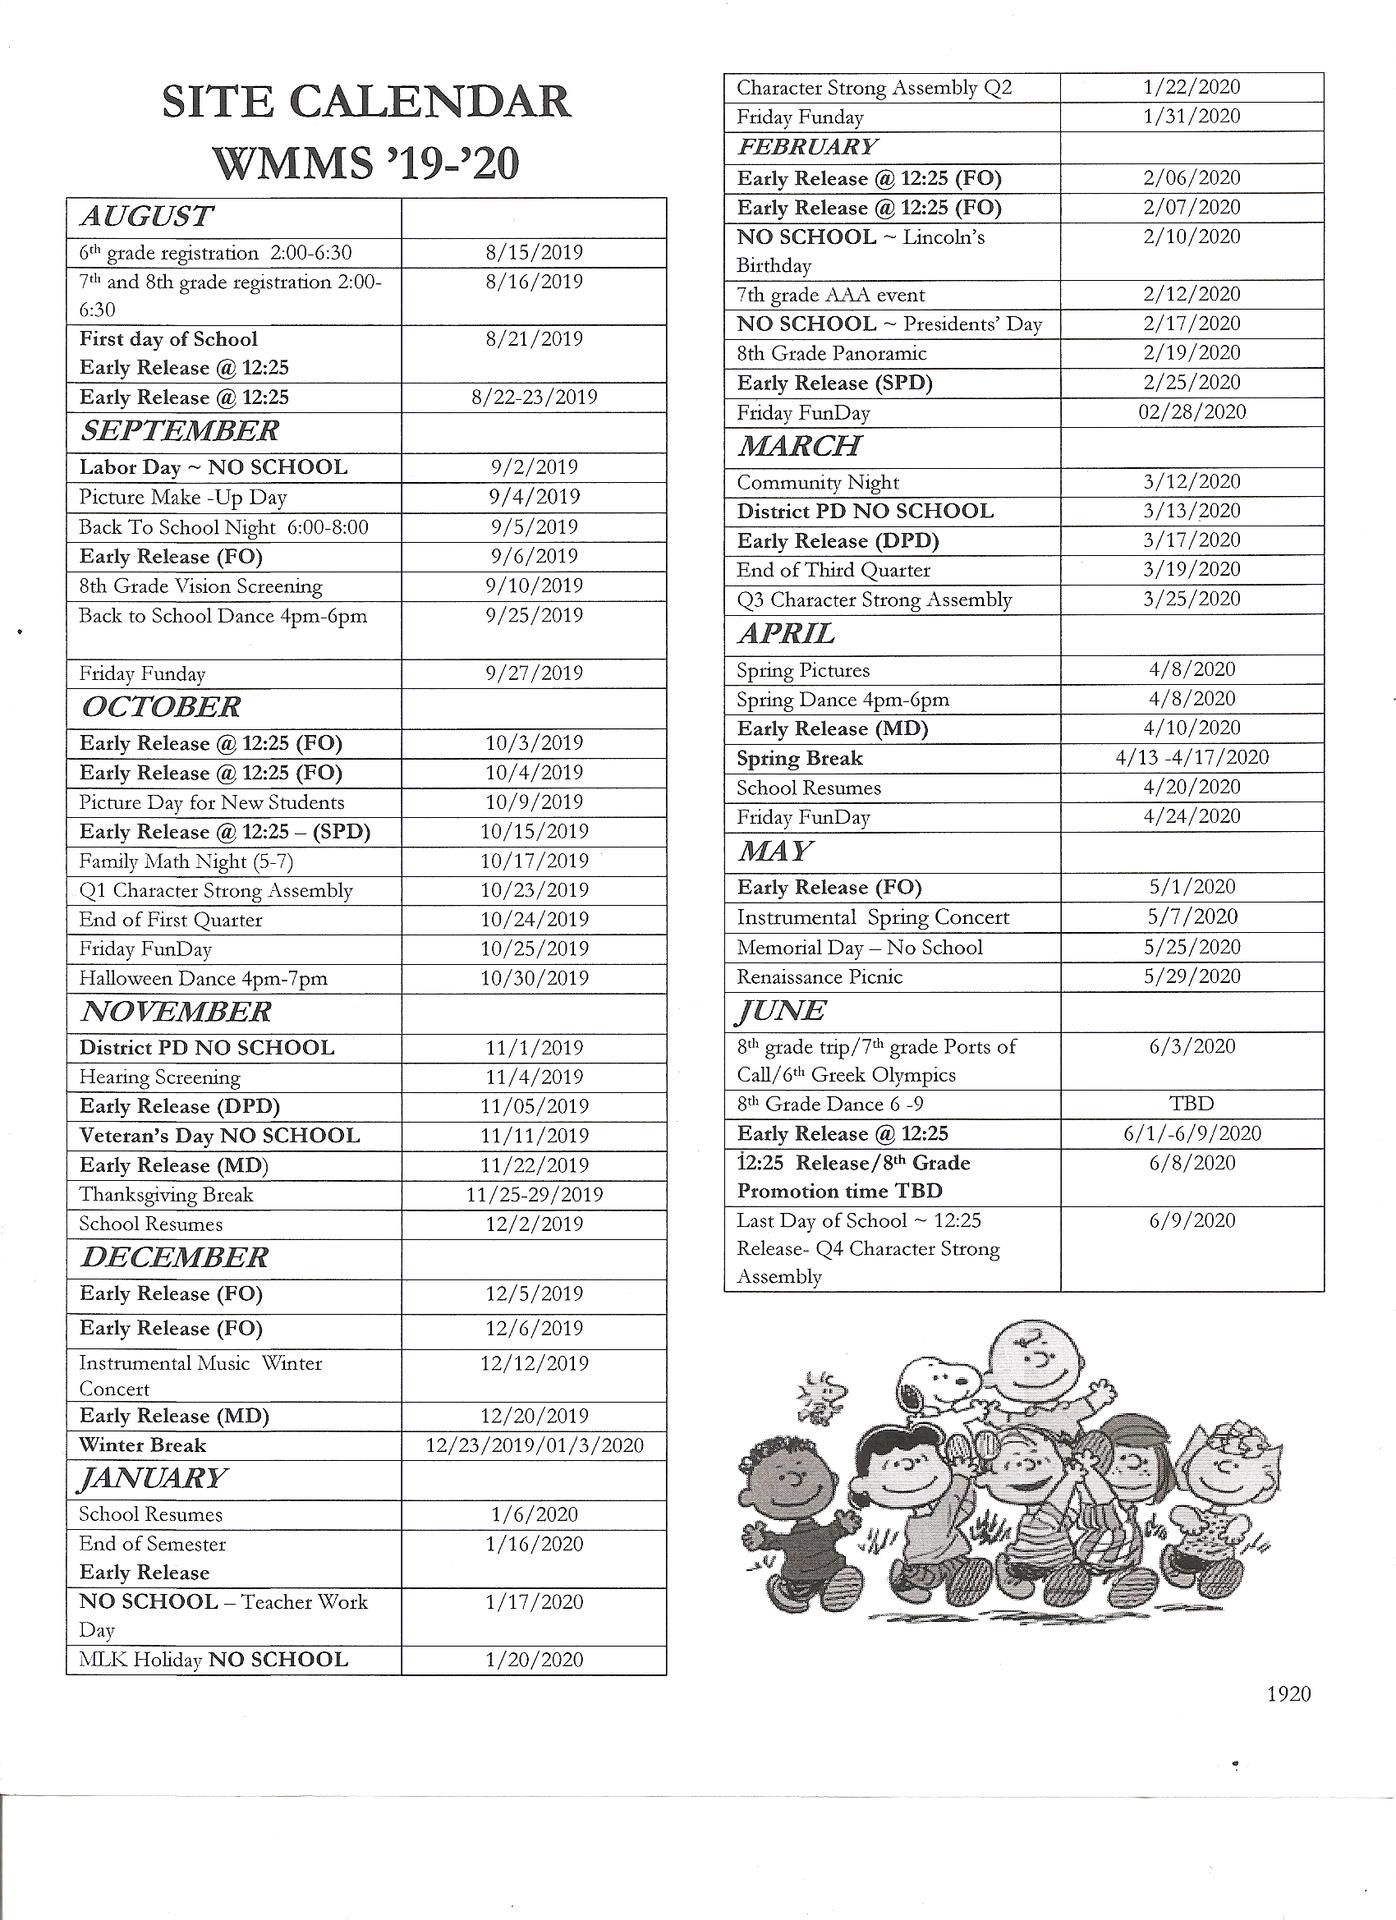 Bell Schedule & Calendar – Our School – Washington Manor Within Sn Leandro High School Calendart